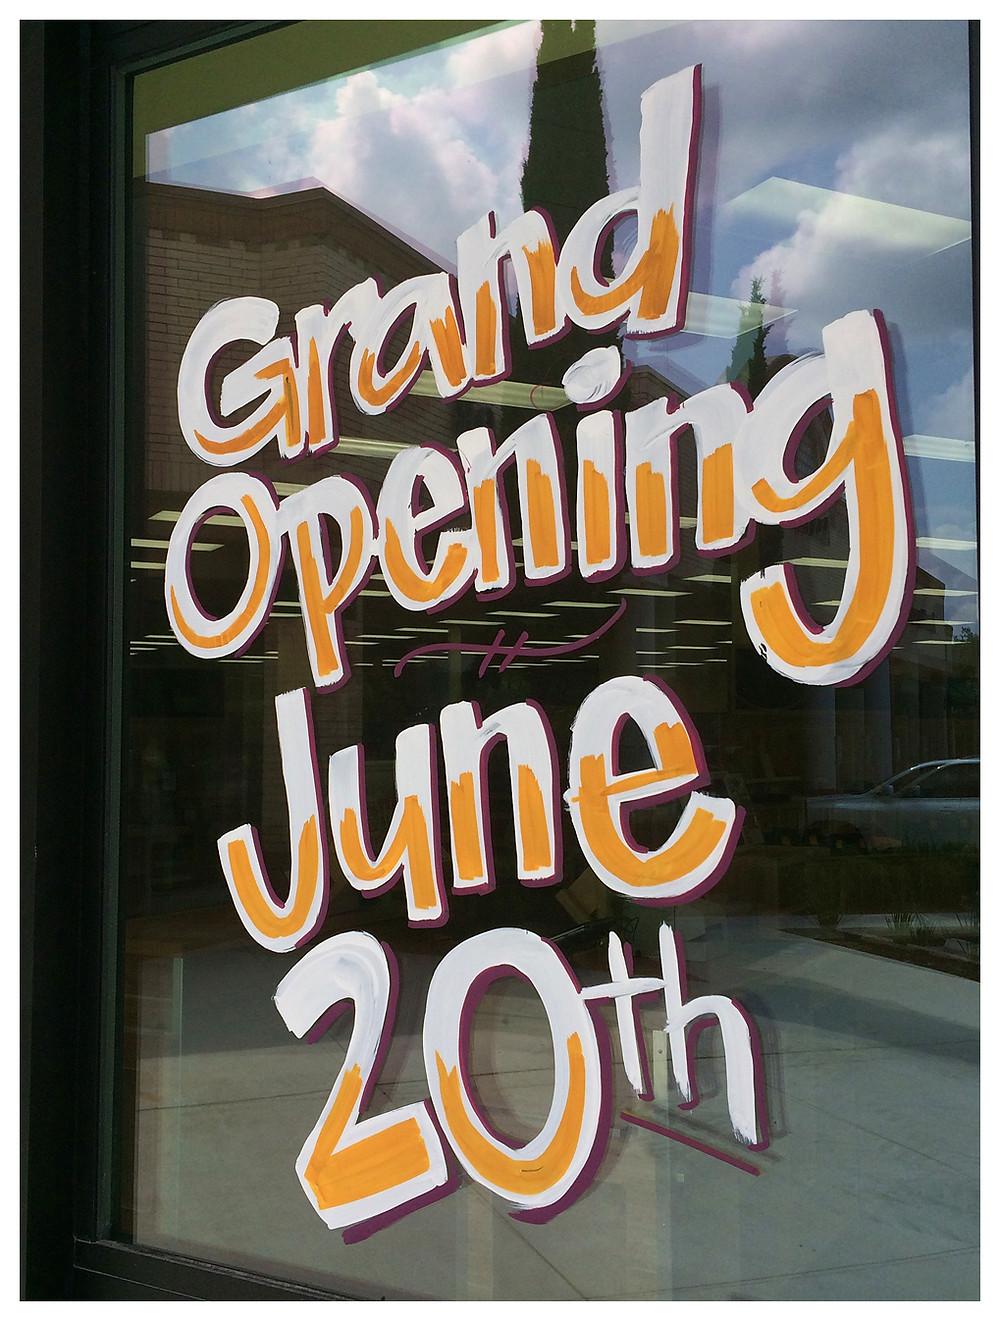 Trader Joe's Austin Arboretum Grand Opening Is June 20, 2014